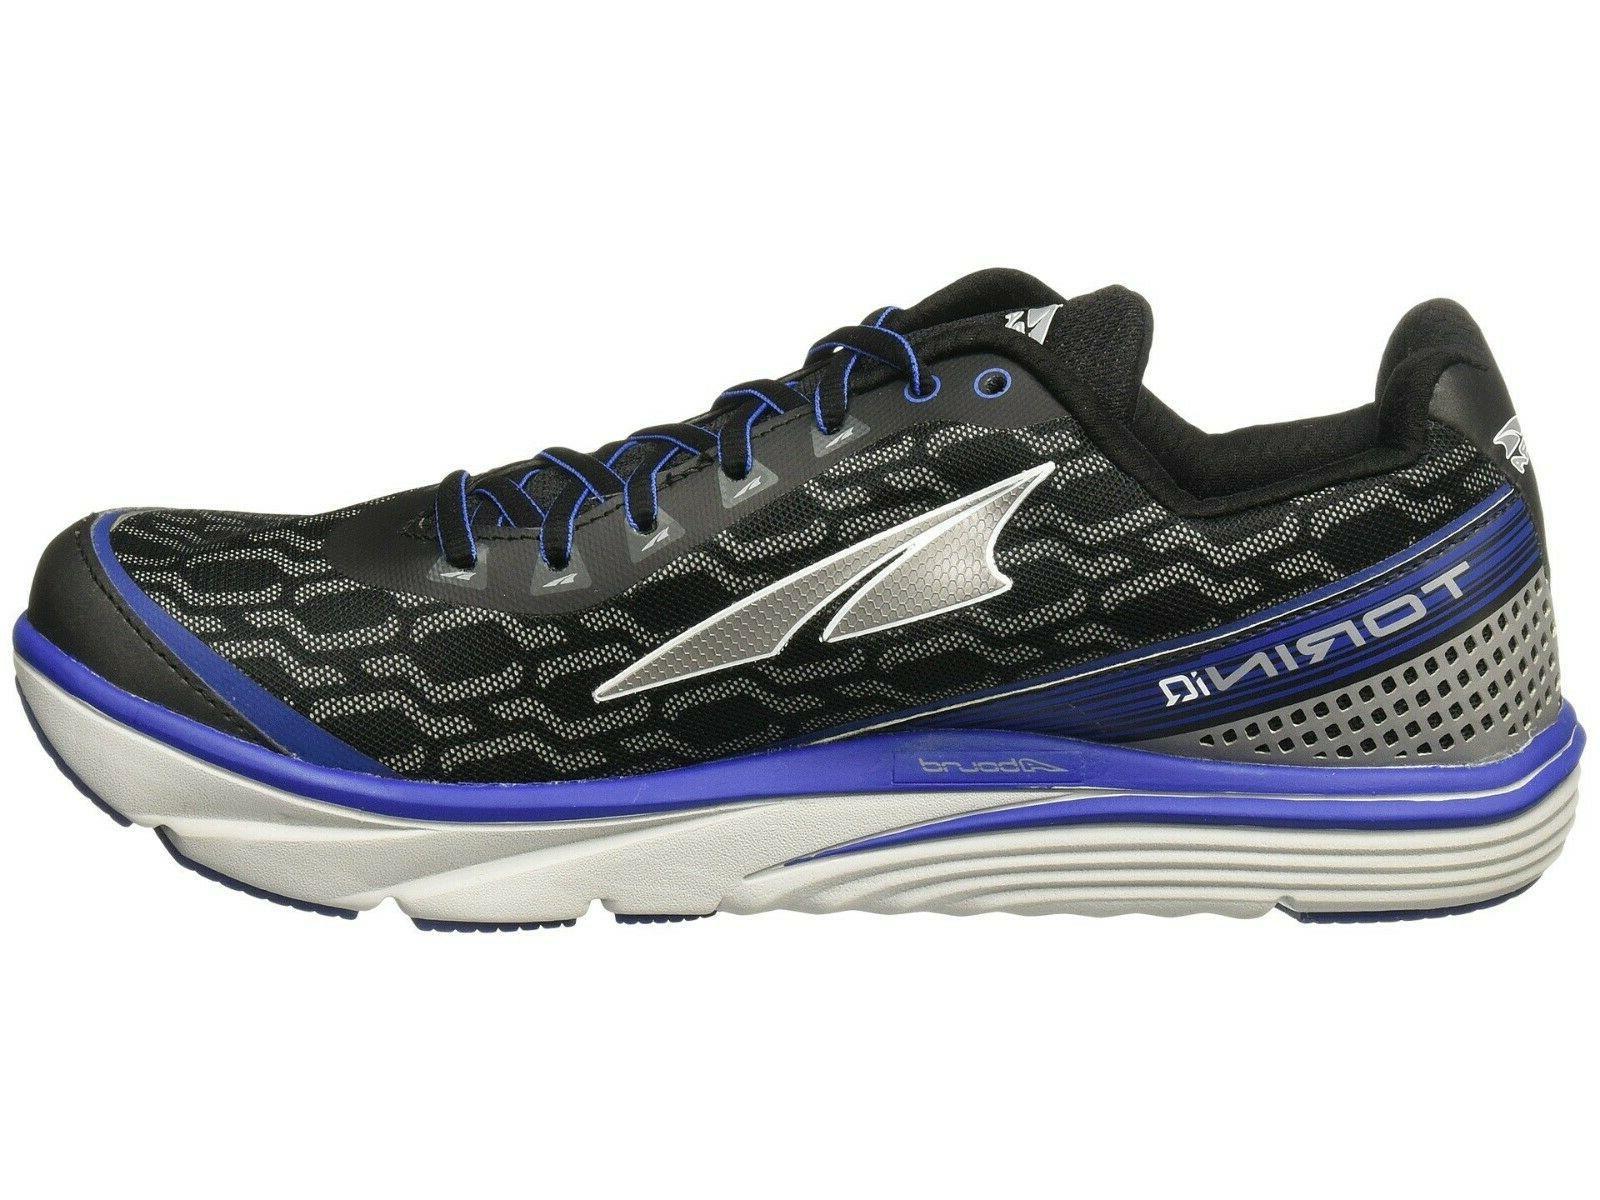 Altra Torin Running Shoes, Size D, Black/Blue